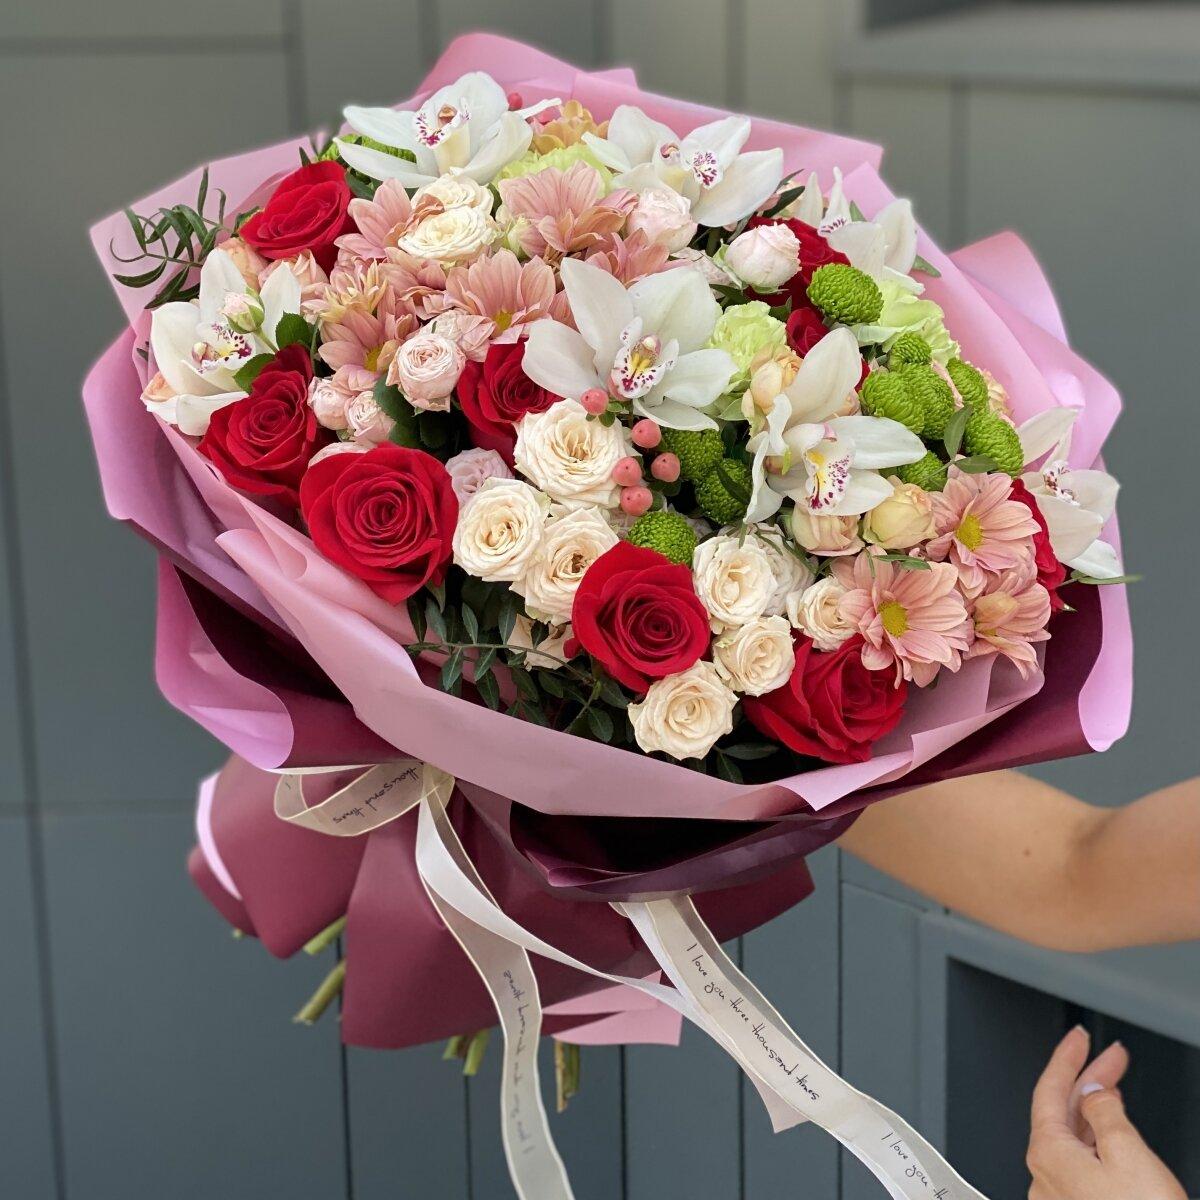 Букет Краски лета из роз, цимбидиума, хризантемы, гиперикума и диантуса